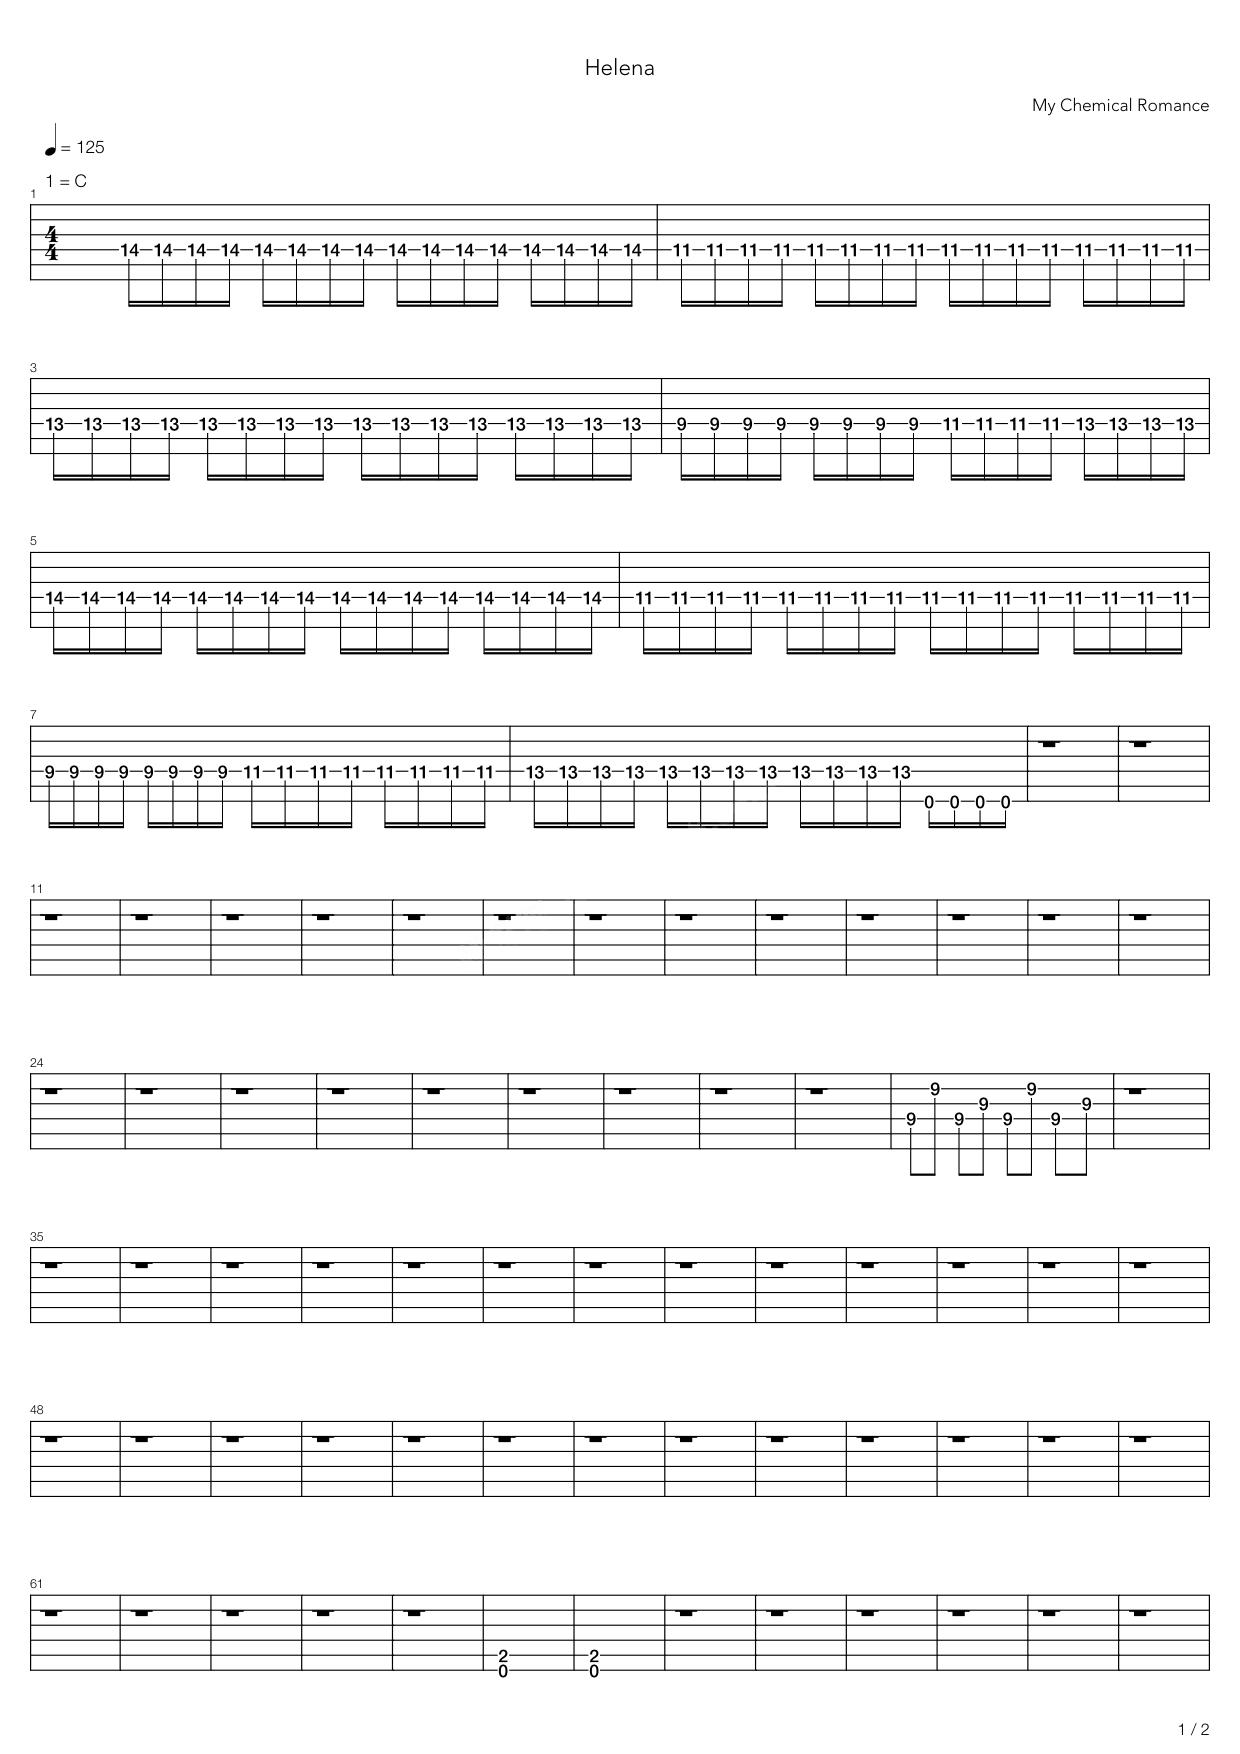 jack johnson吉他谱_Helena吉他谱 My Chemical Romance-彼岸吉他 - 一站式吉他爱好者服务平台